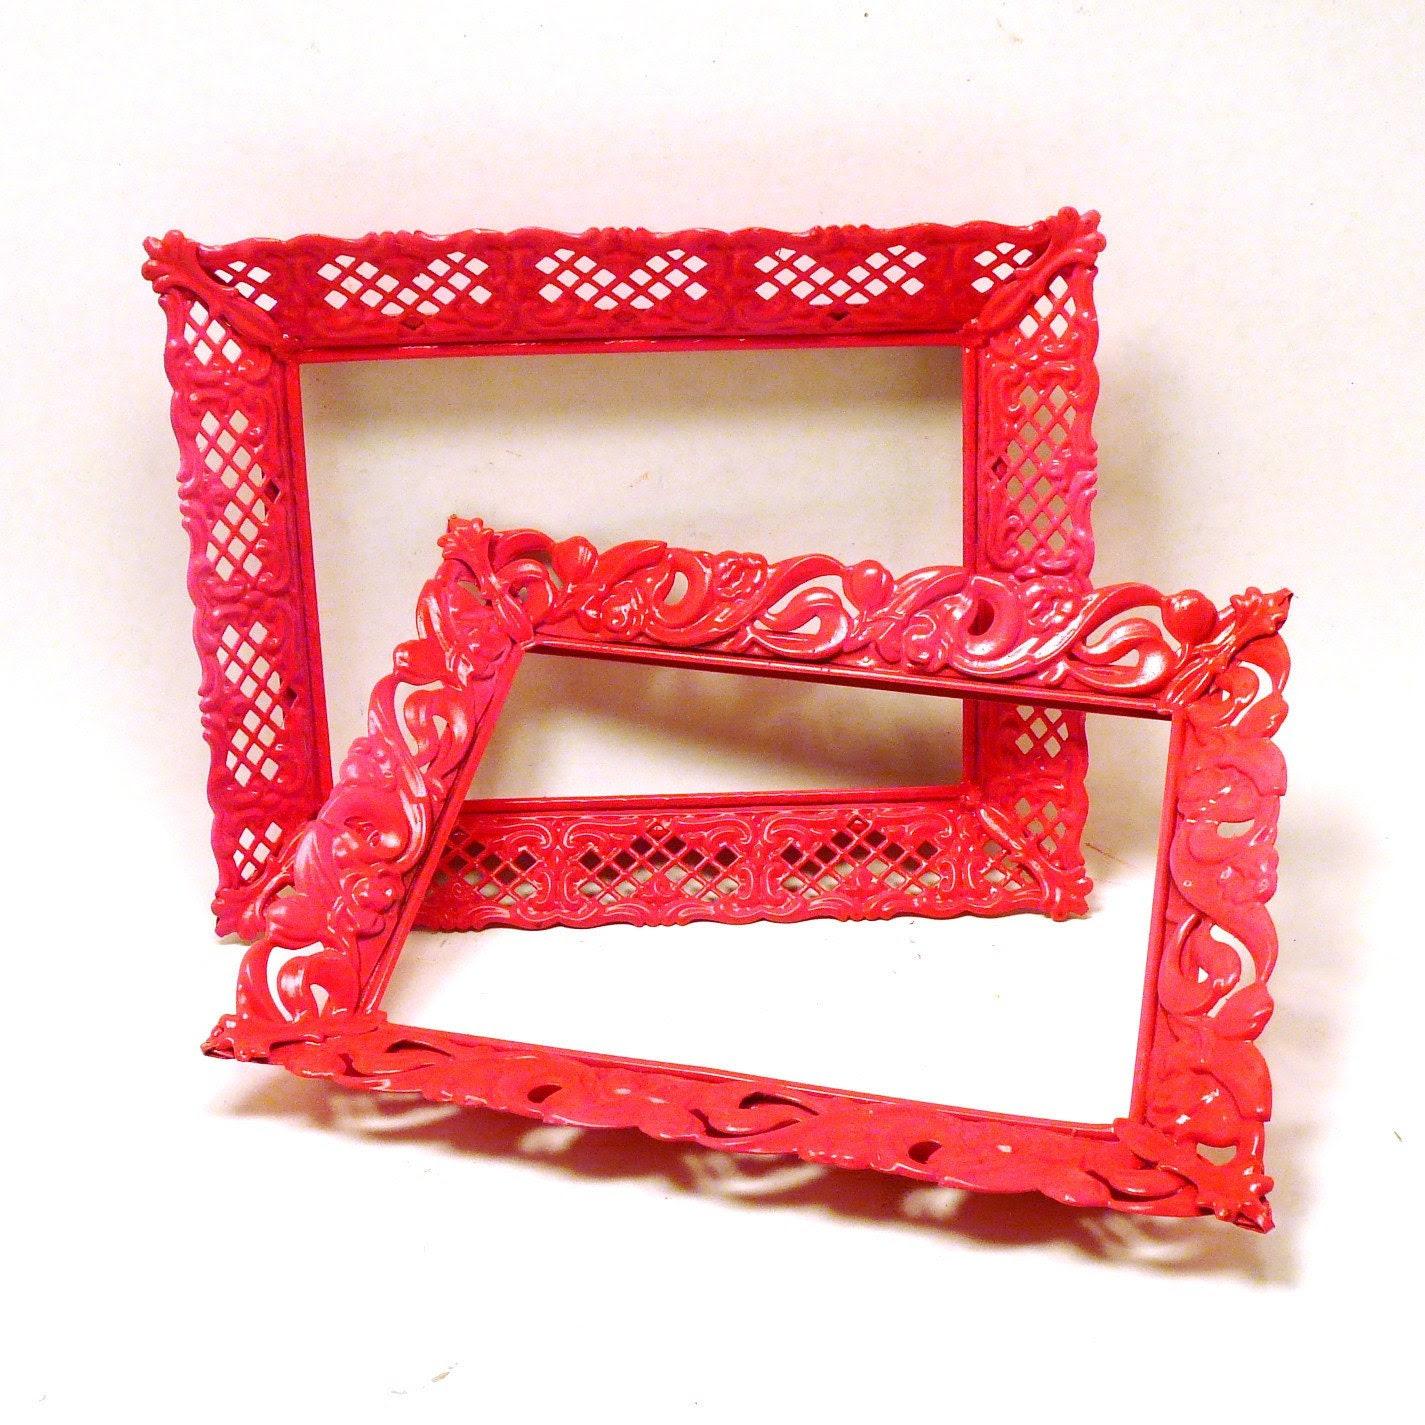 upcycled frames // vintage kitsch, neon pink decor, ornate picture frame metal, victorian, summer trends, raspberry - nashpop